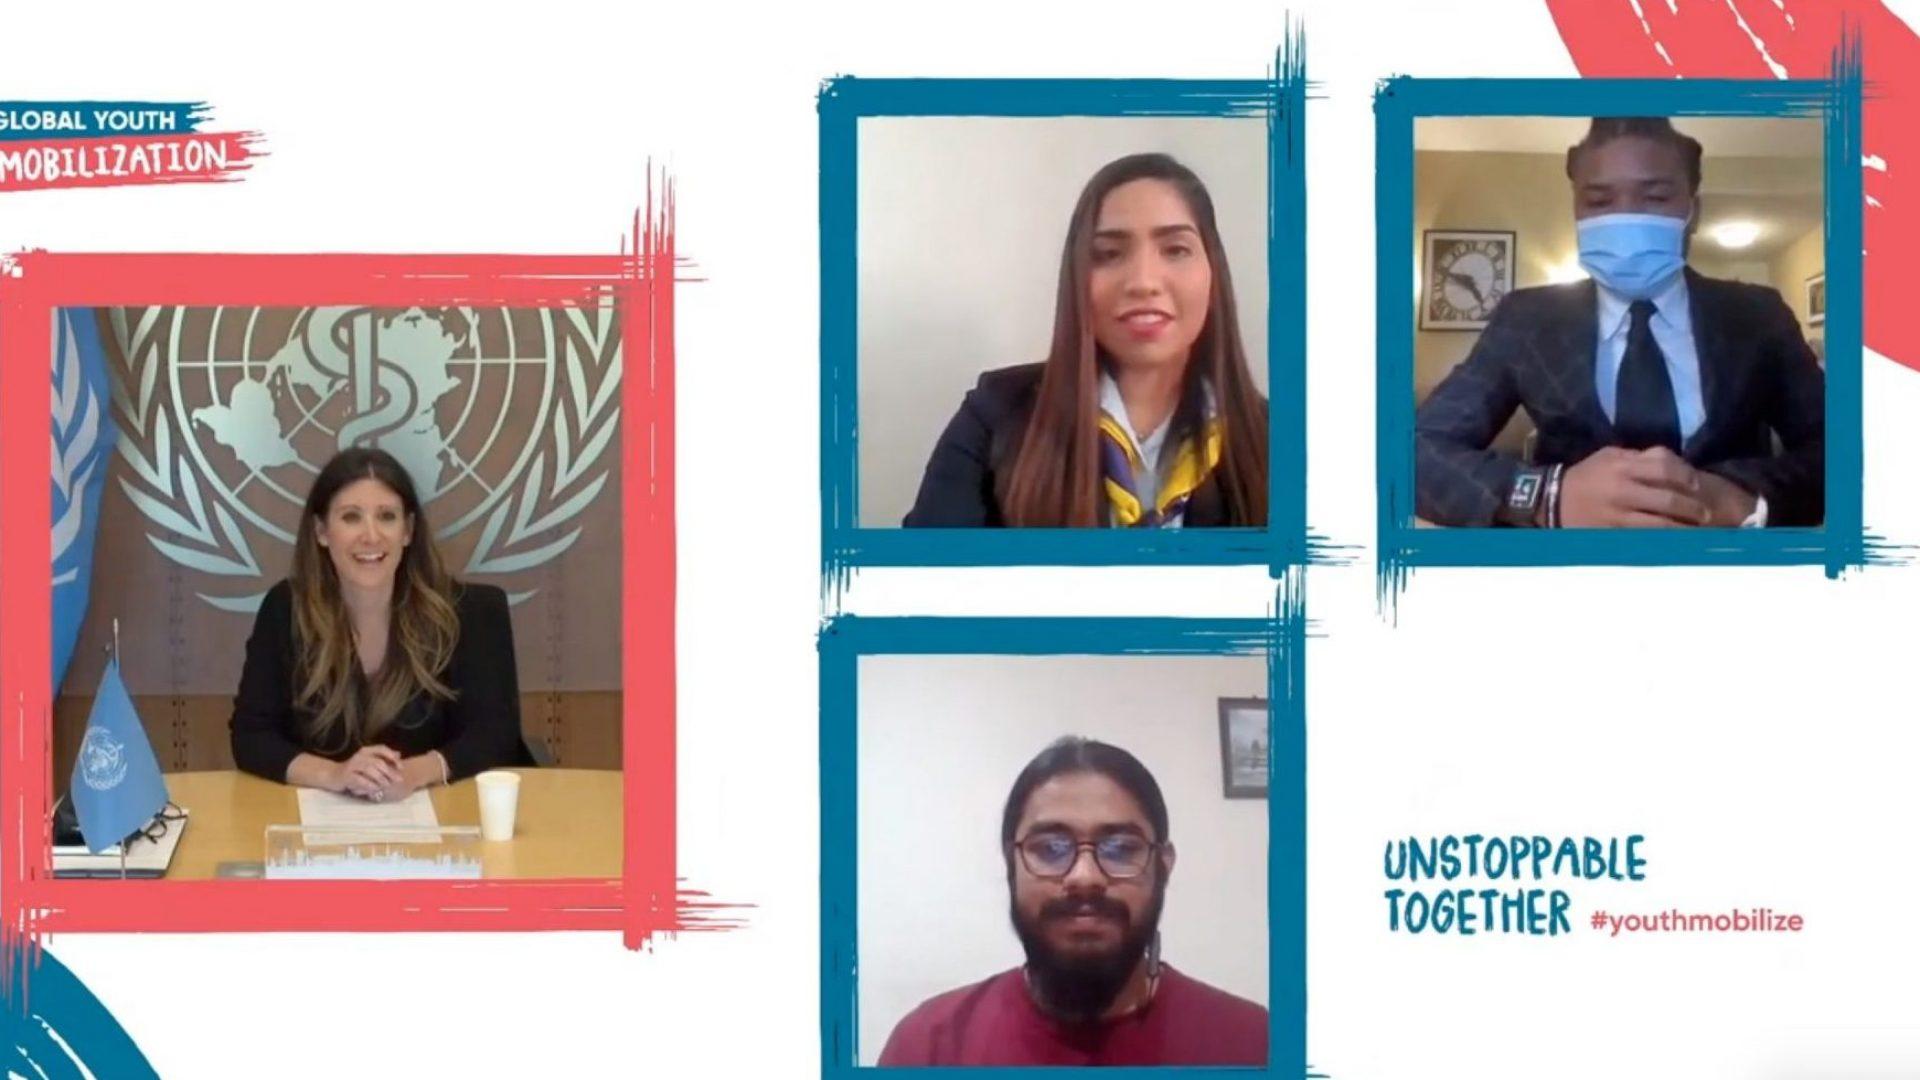 Global Youth Summit 2021